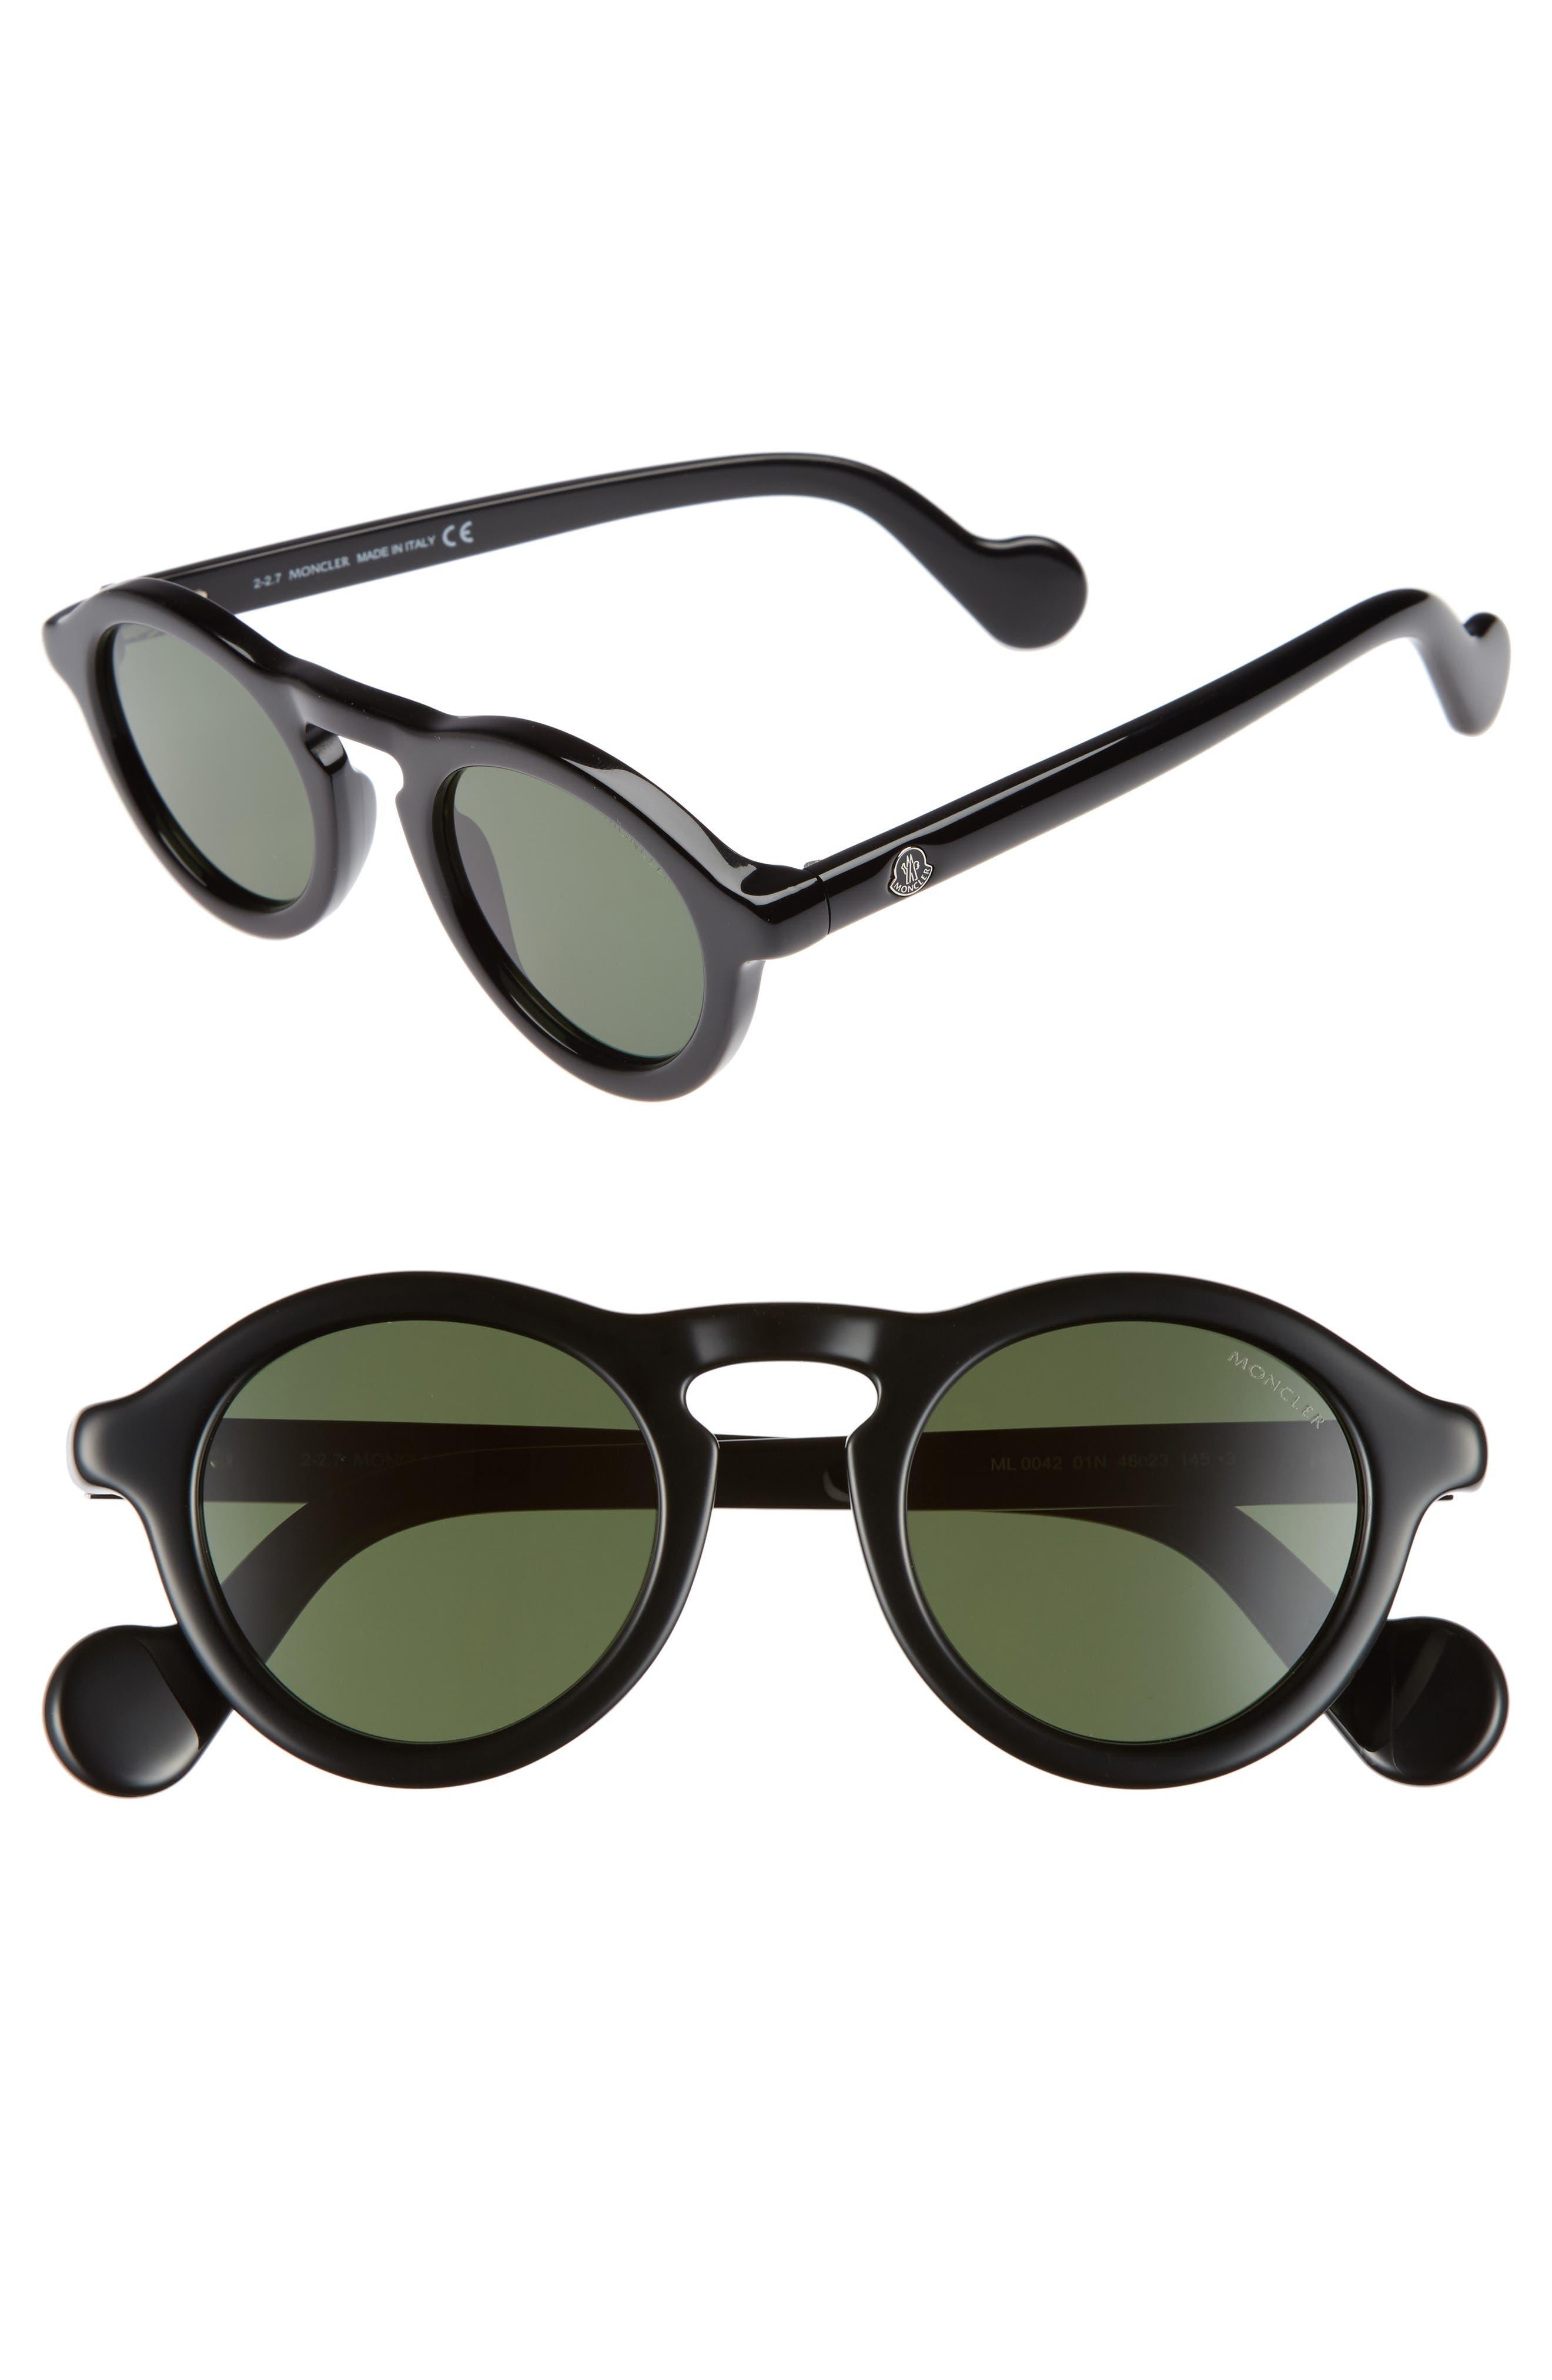 46mm Round Sunglasses,                         Main,                         color, Shiny Black/ Green